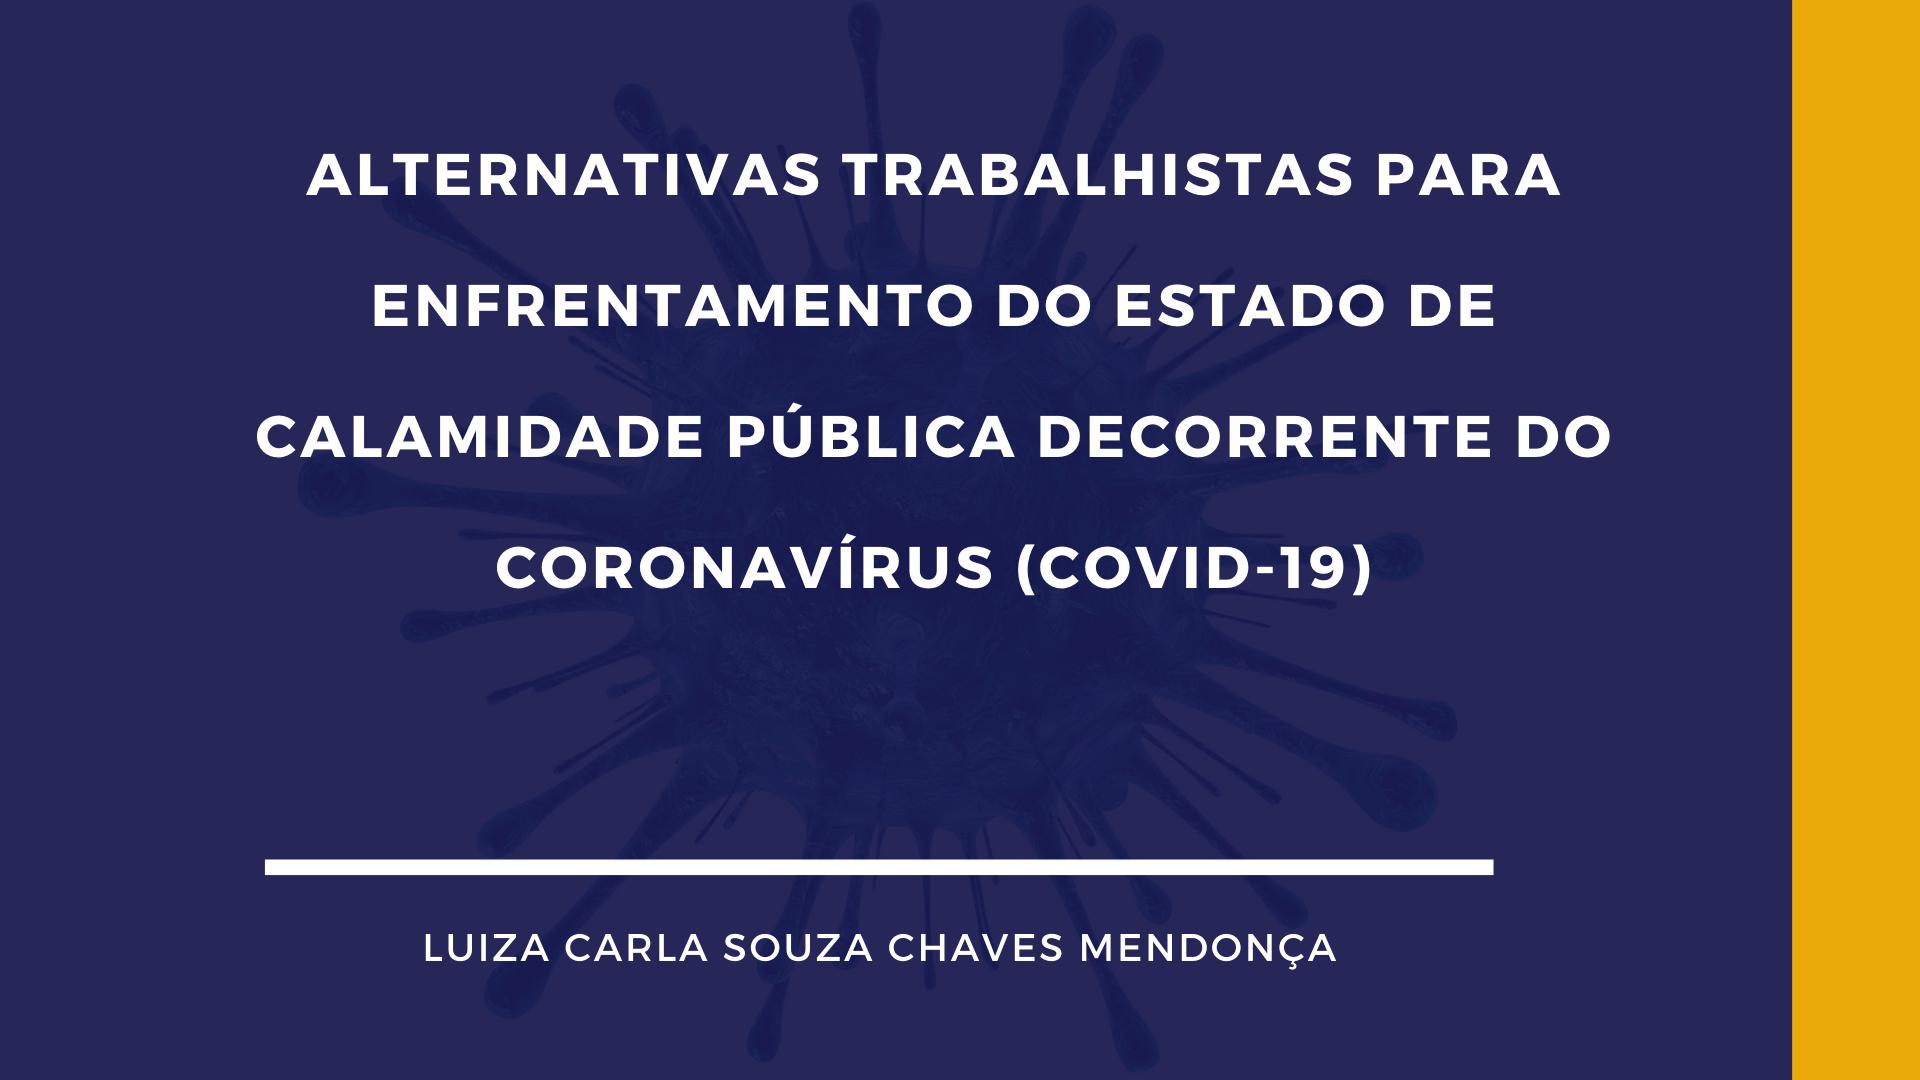 ALTERNATIVAS_TRABALHISTAS_PARA_ENFRENTAM